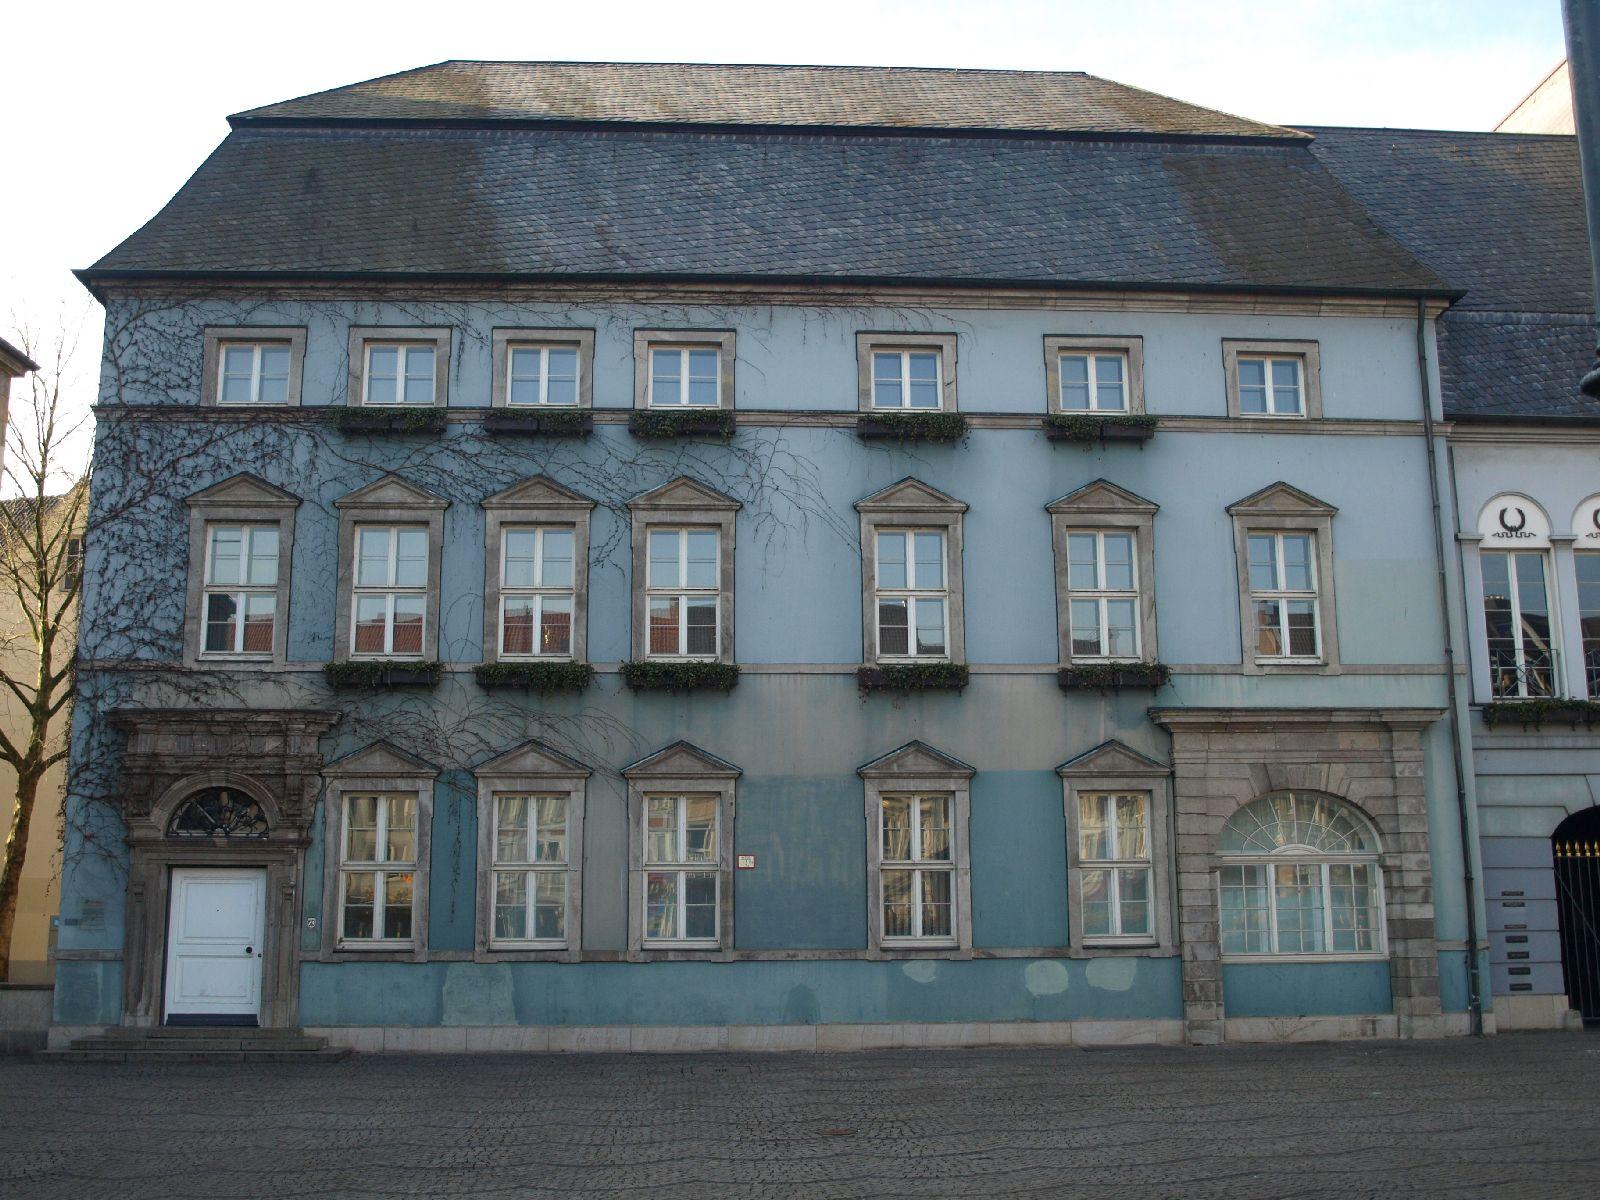 Gebaeude-Architektur_Textur_A_P1179324